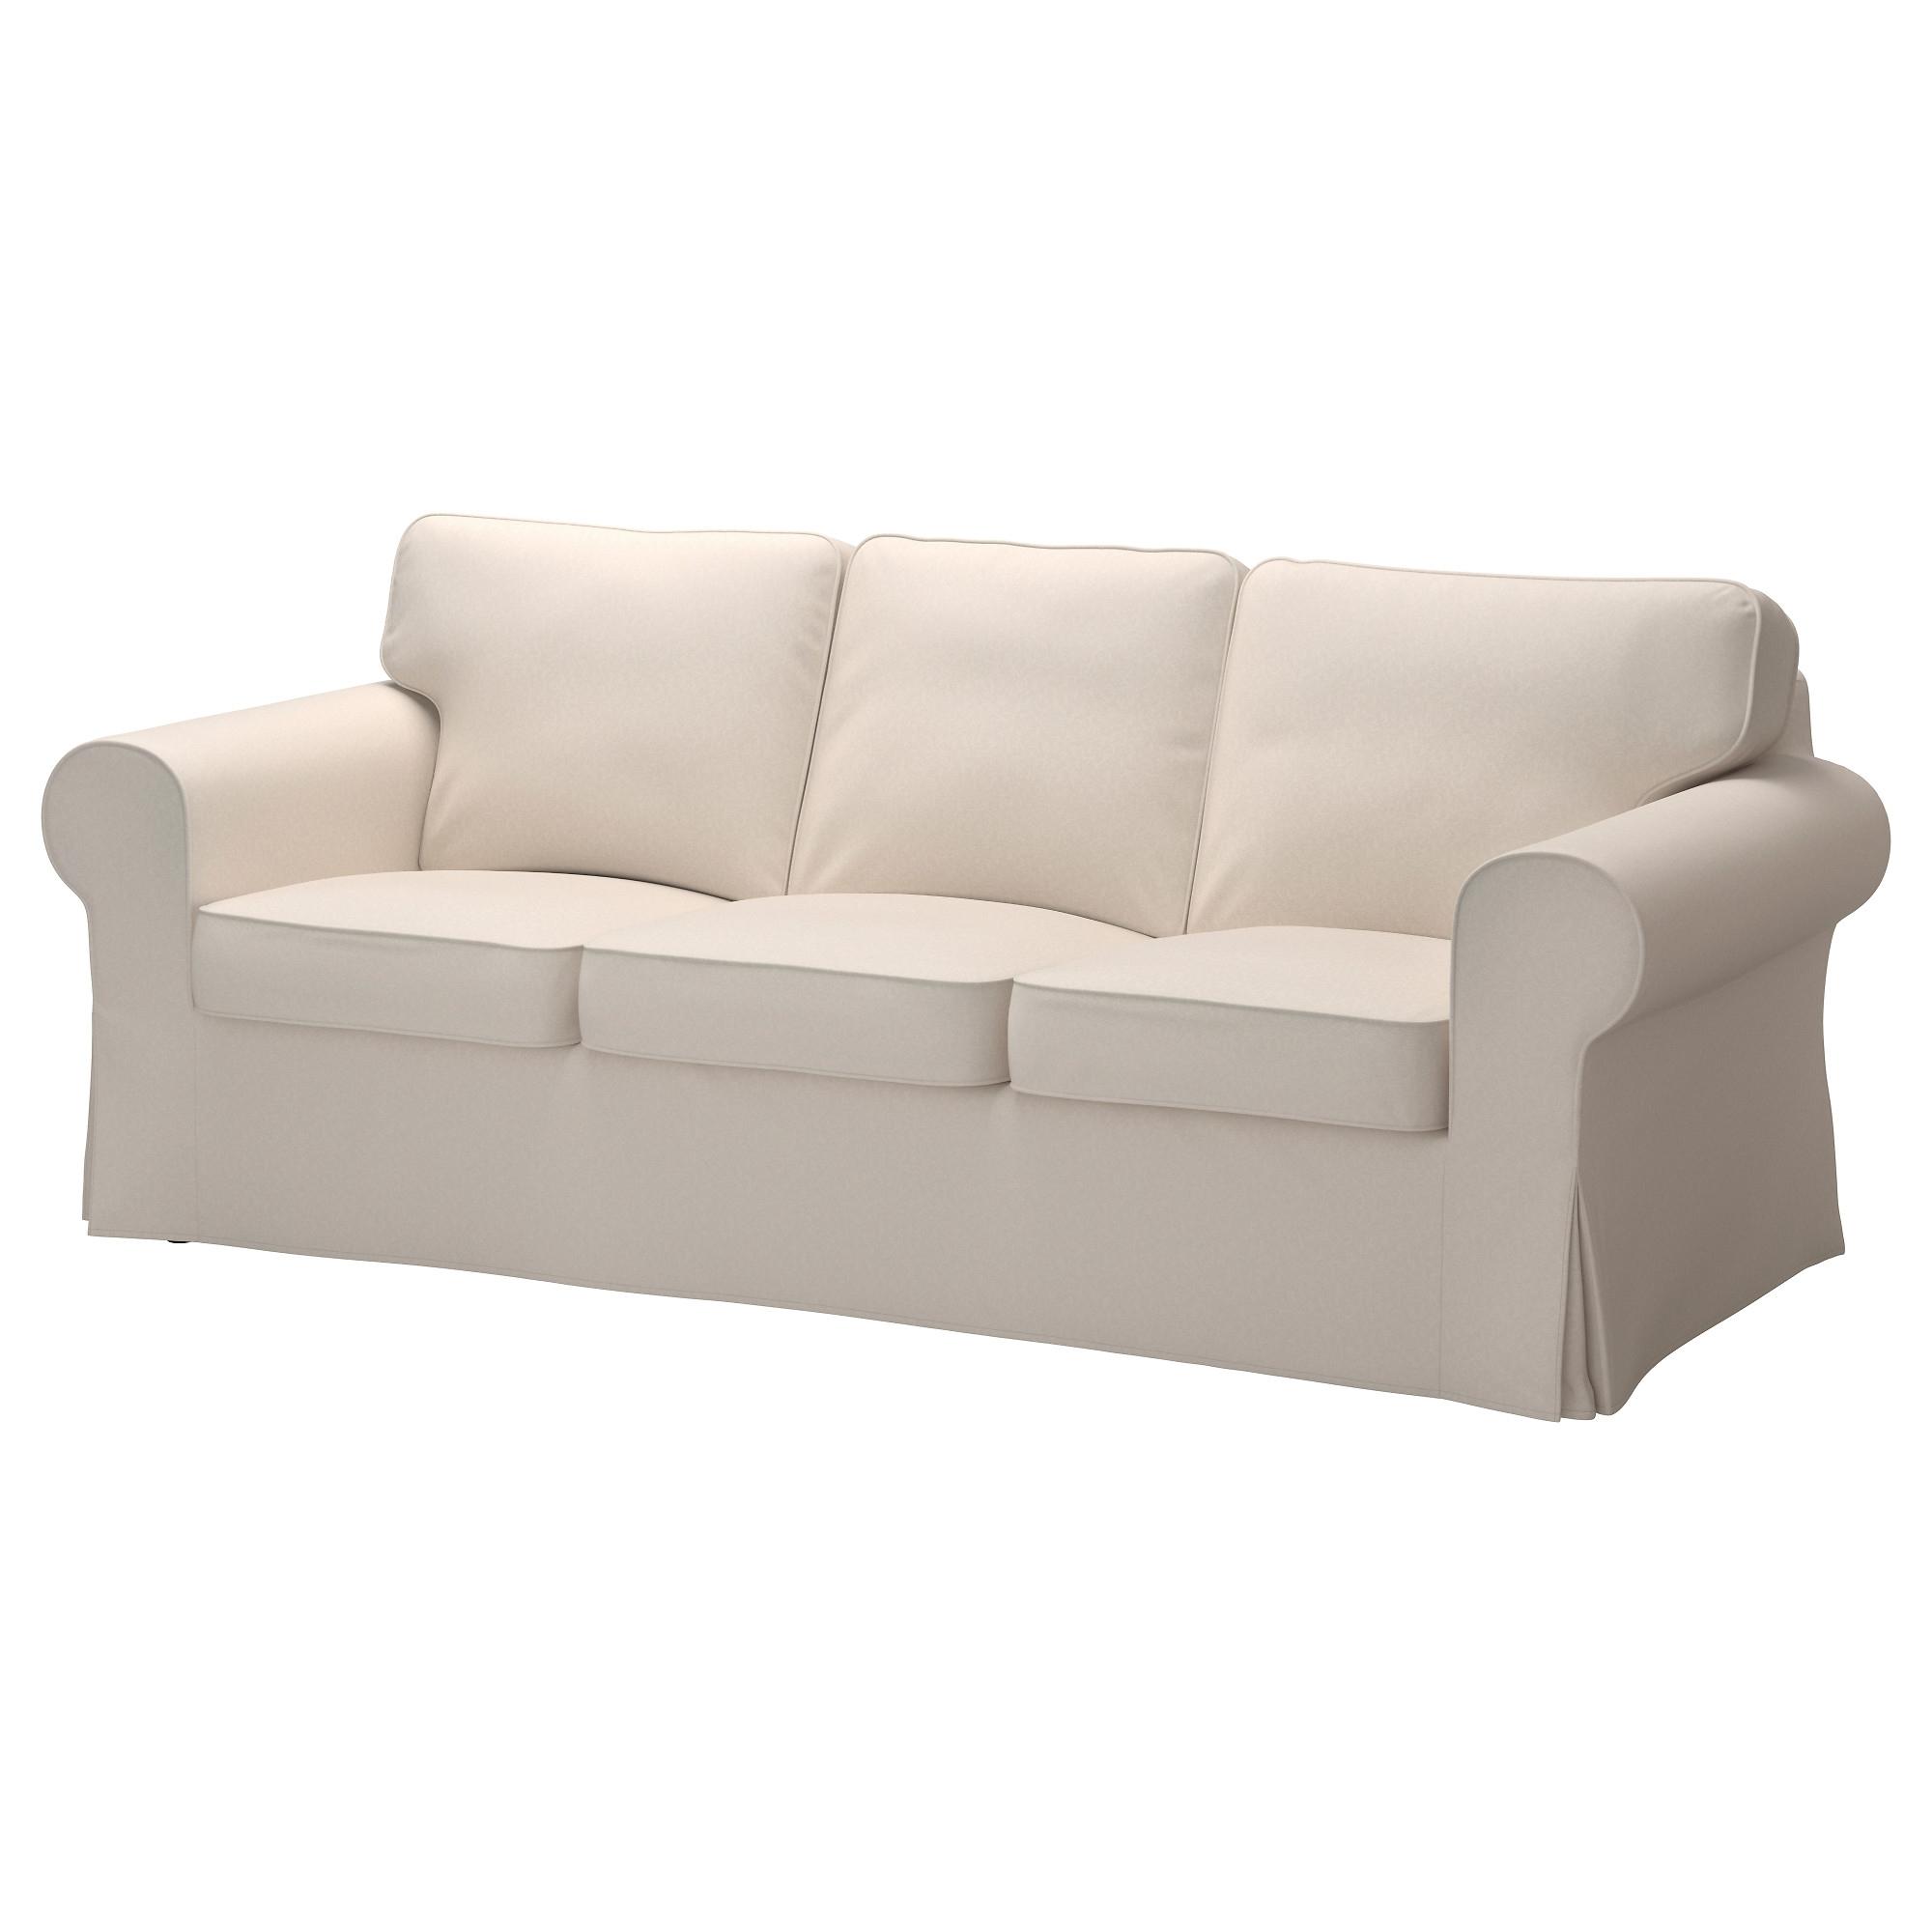 Ektorp Sofa – Lofallet Beige – Ikea Inside Ikea Small Sofas (View 4 of 10)